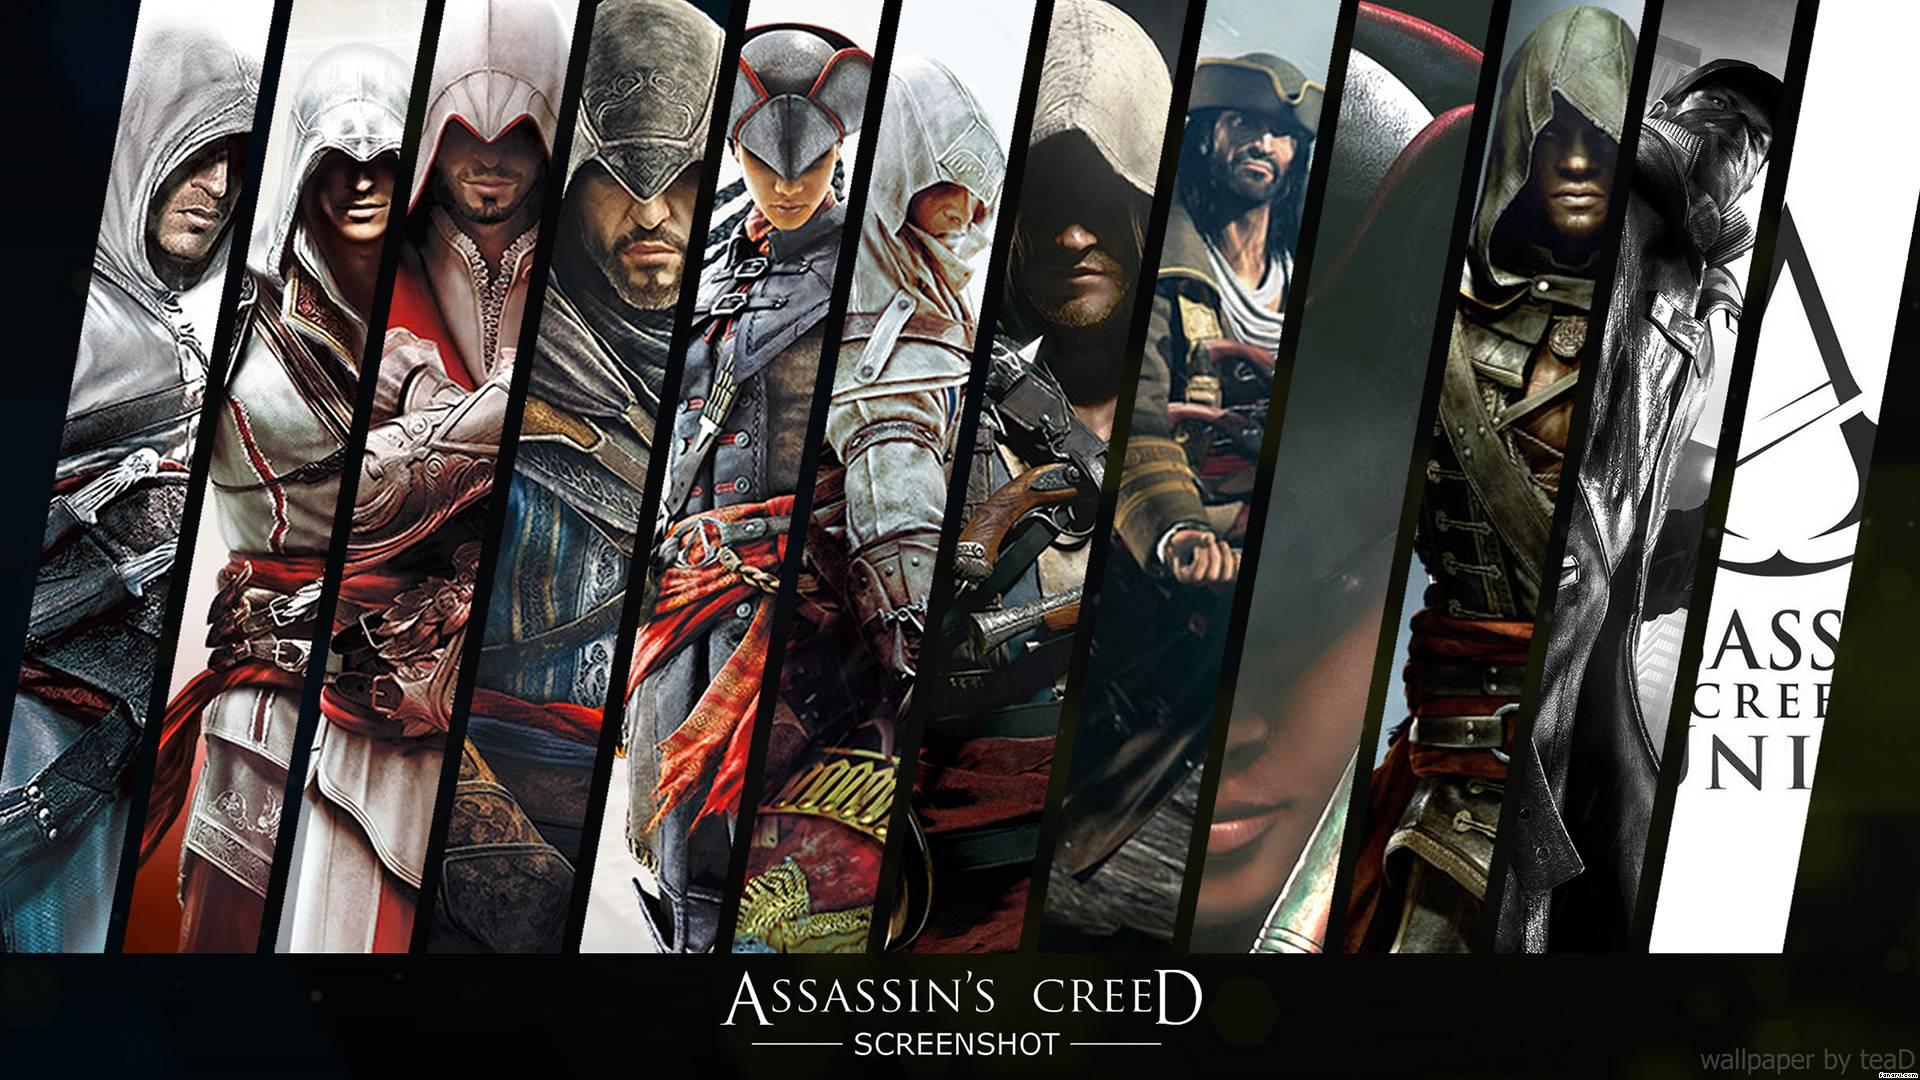 Epic assassins quotes quotesgram - Assasins wallpaper ...